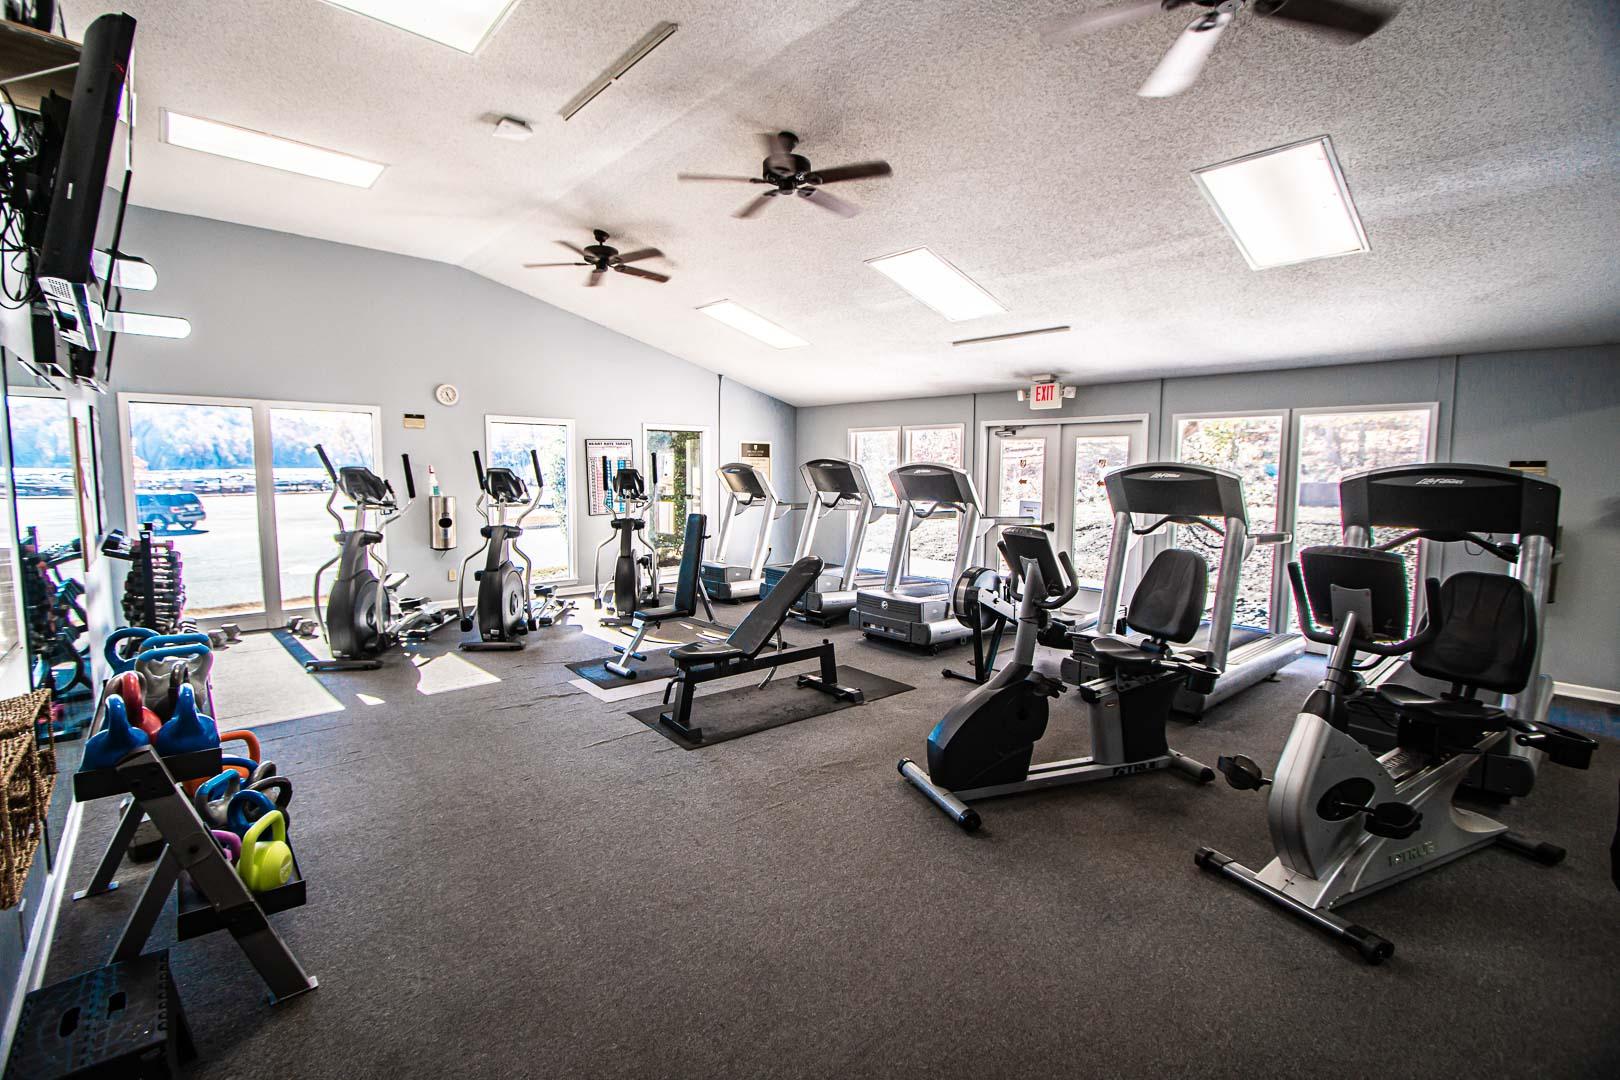 A spacious exercise room at VRI's Mountain Loft Resort in North Carolina.